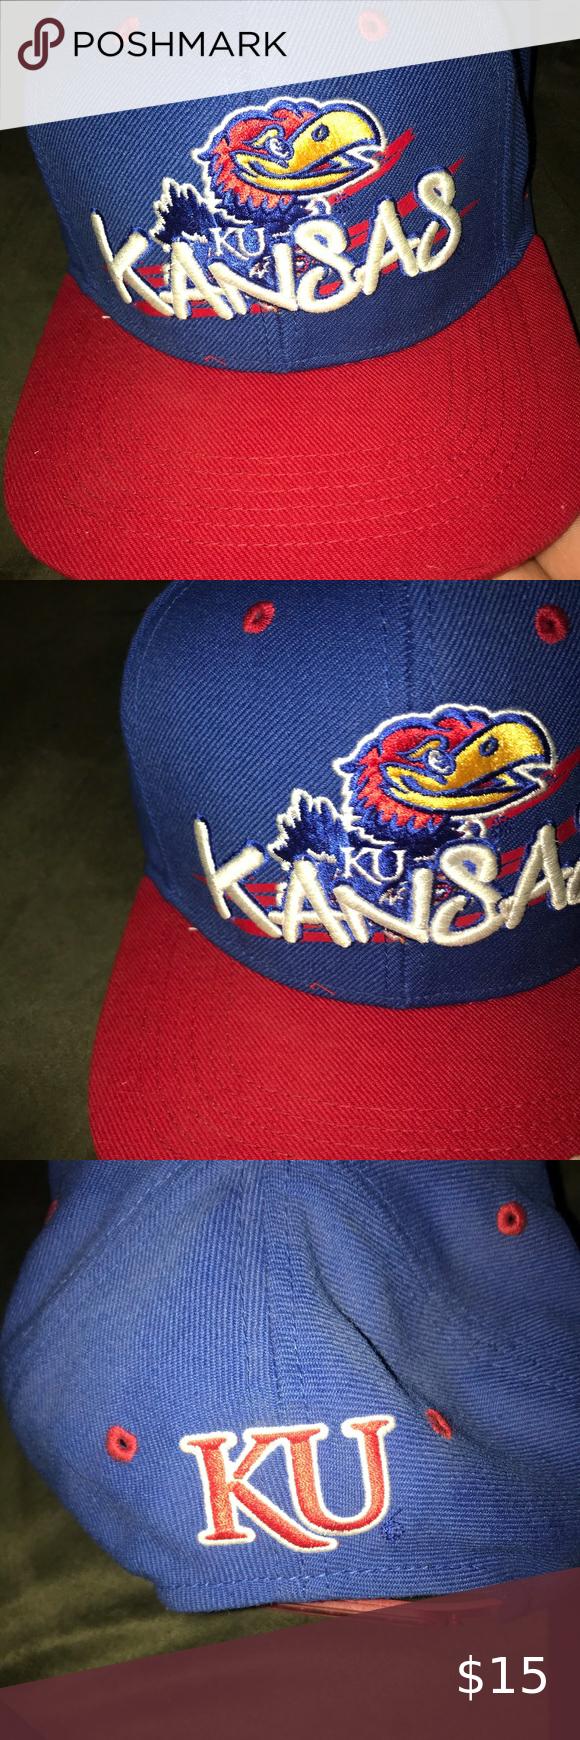 Ku Kansas Baseball Hat With Adjustable Strap In 2020 Baseball Hats Adjustable Straps Hats